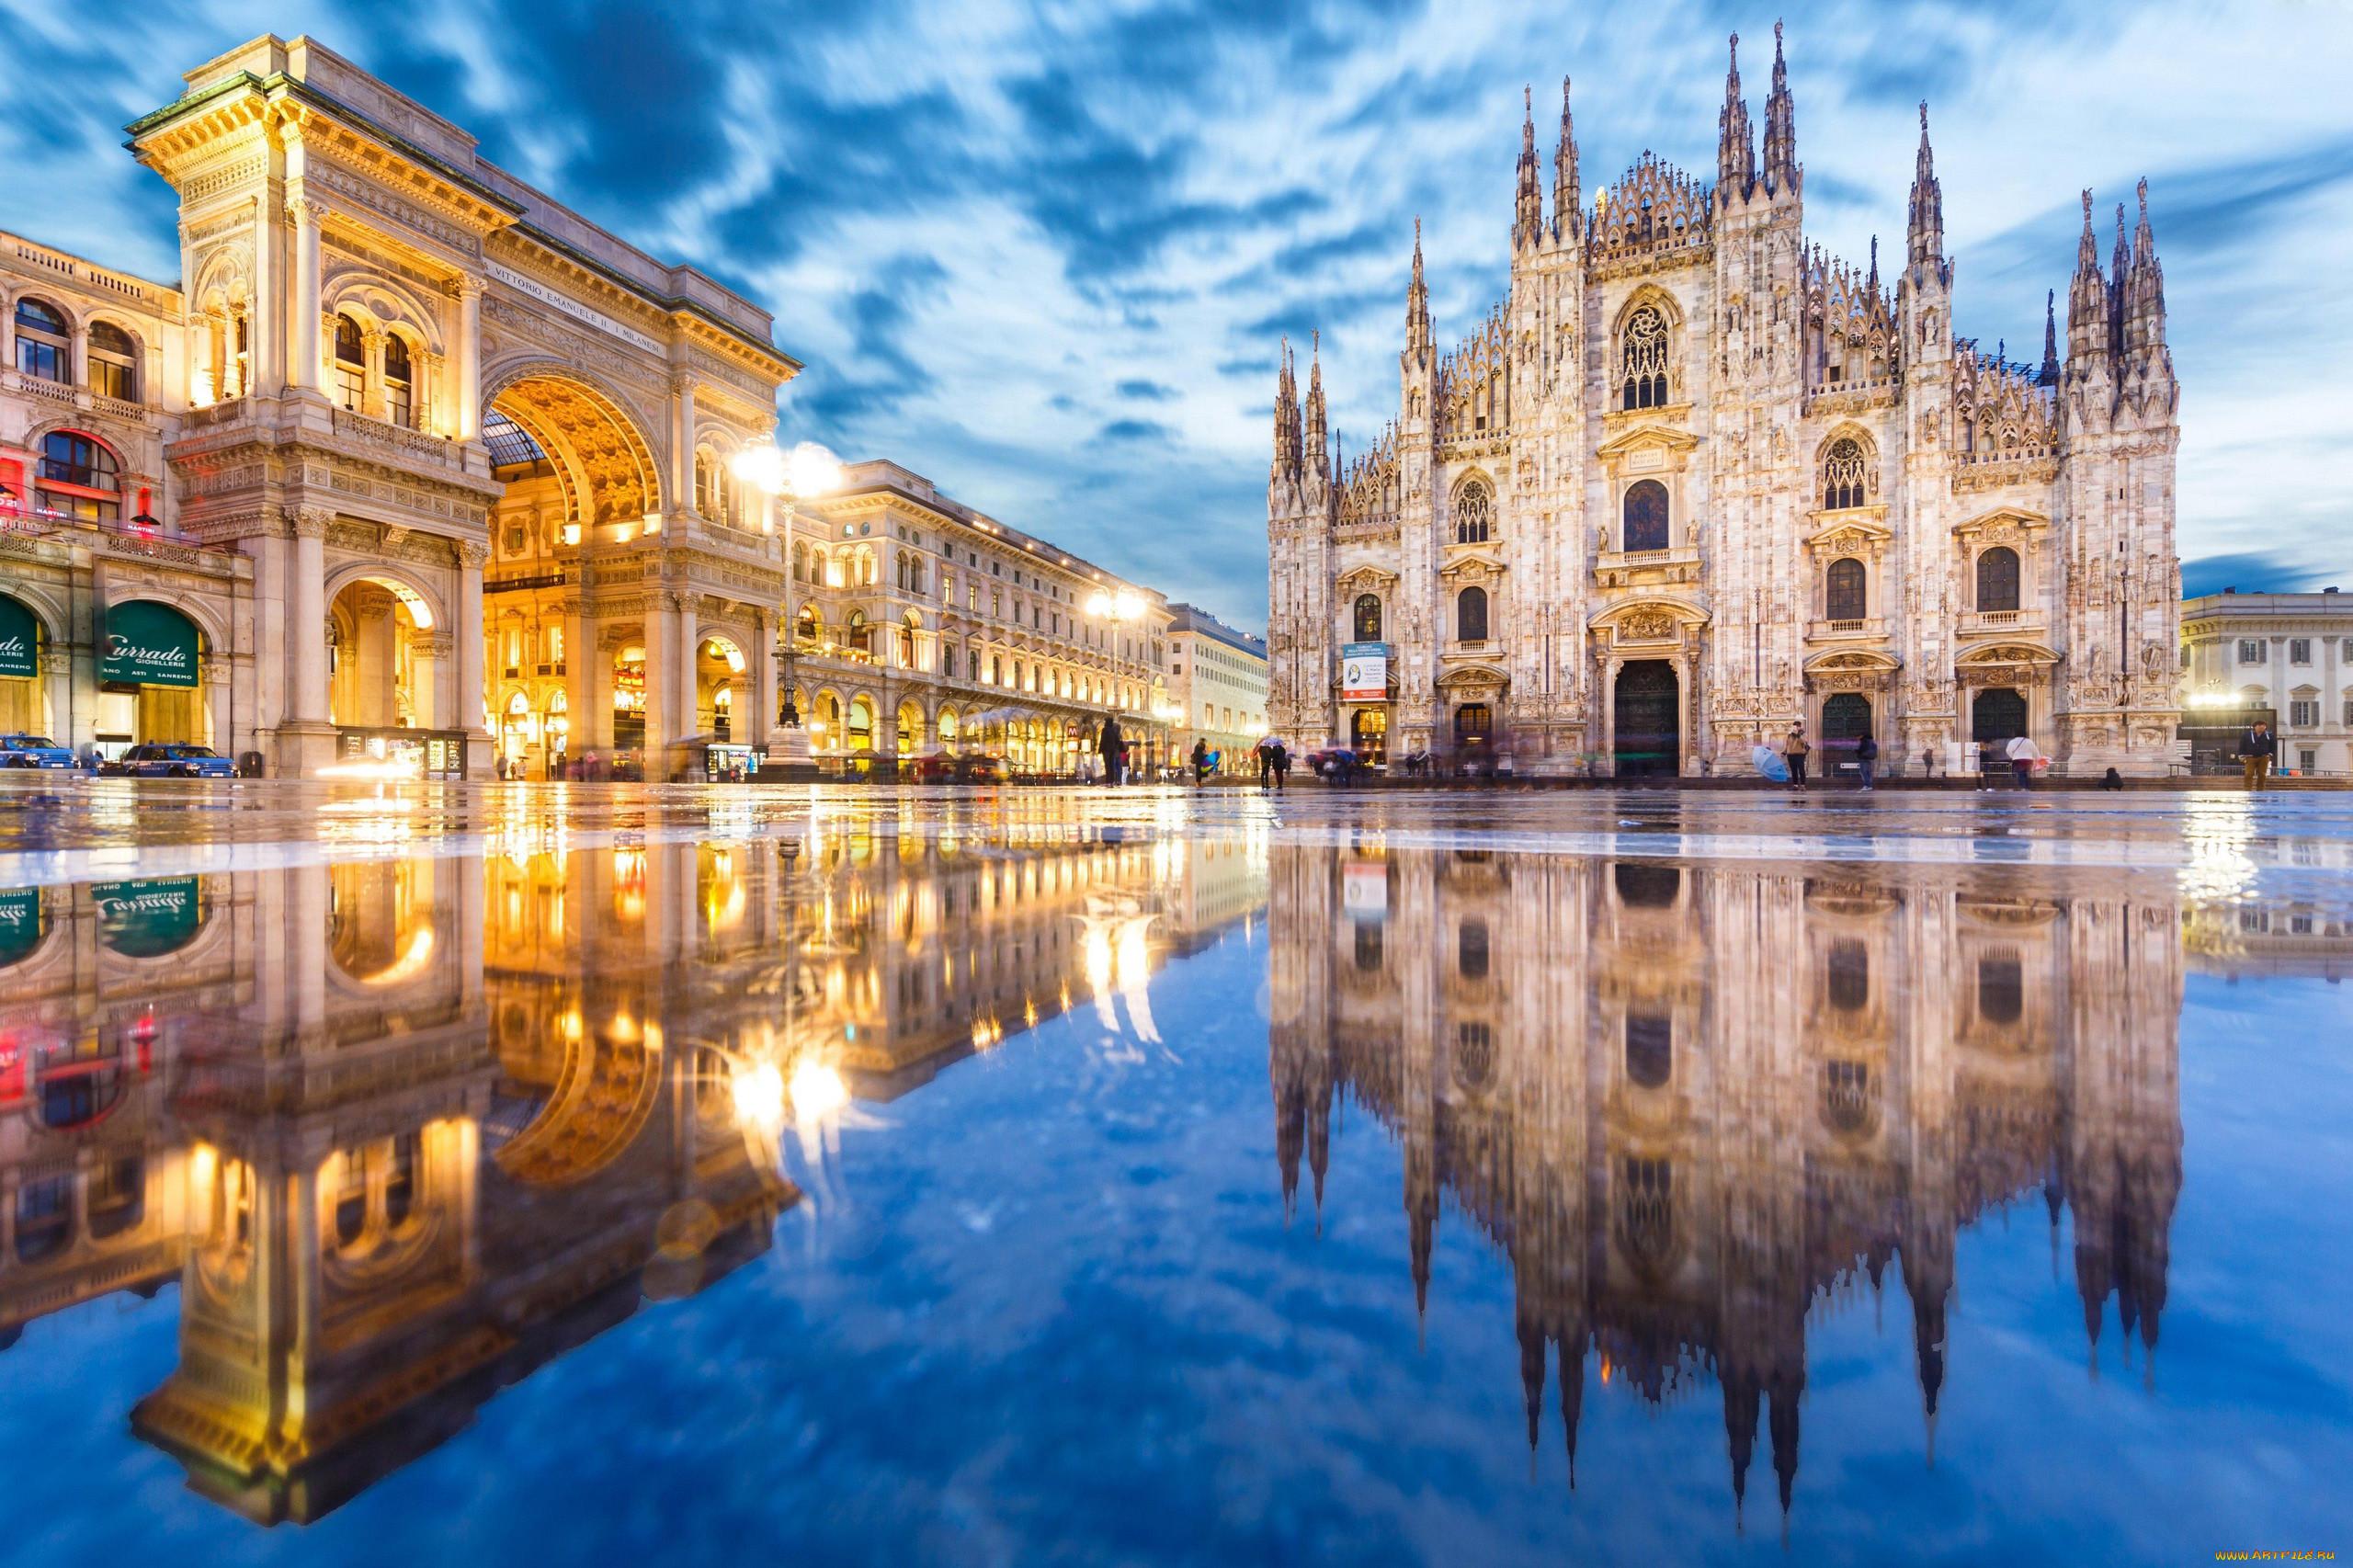 город милан италия фото заболевание может независимо